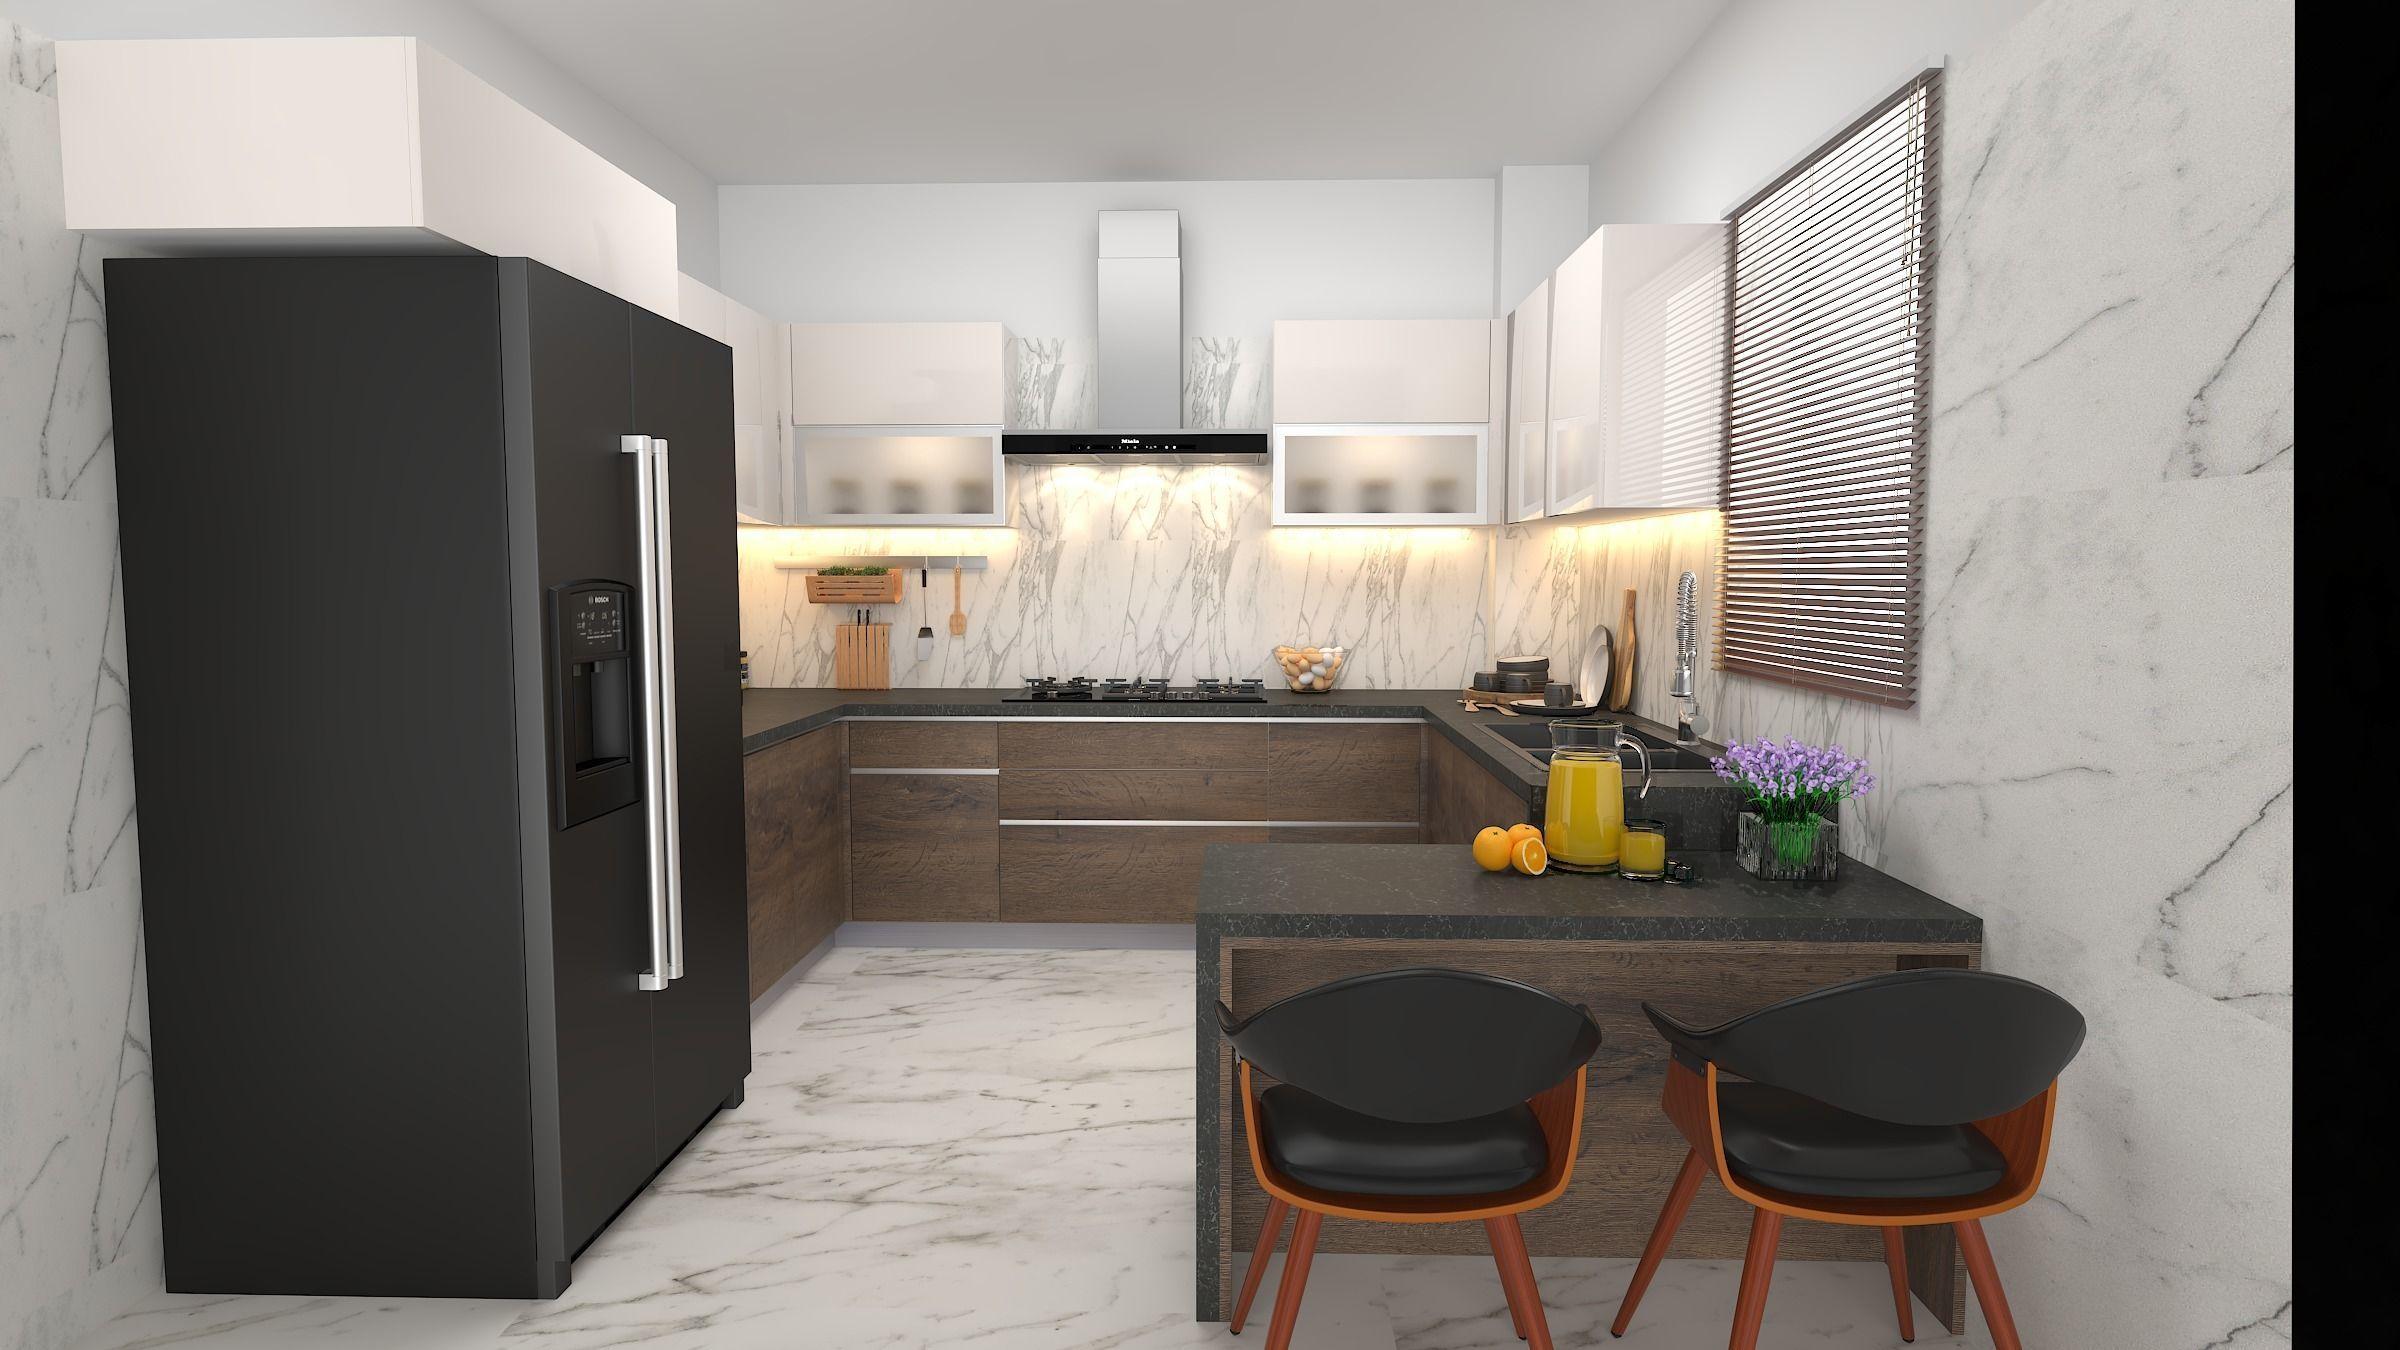 kitchen interior 3d model modular  cgtrader